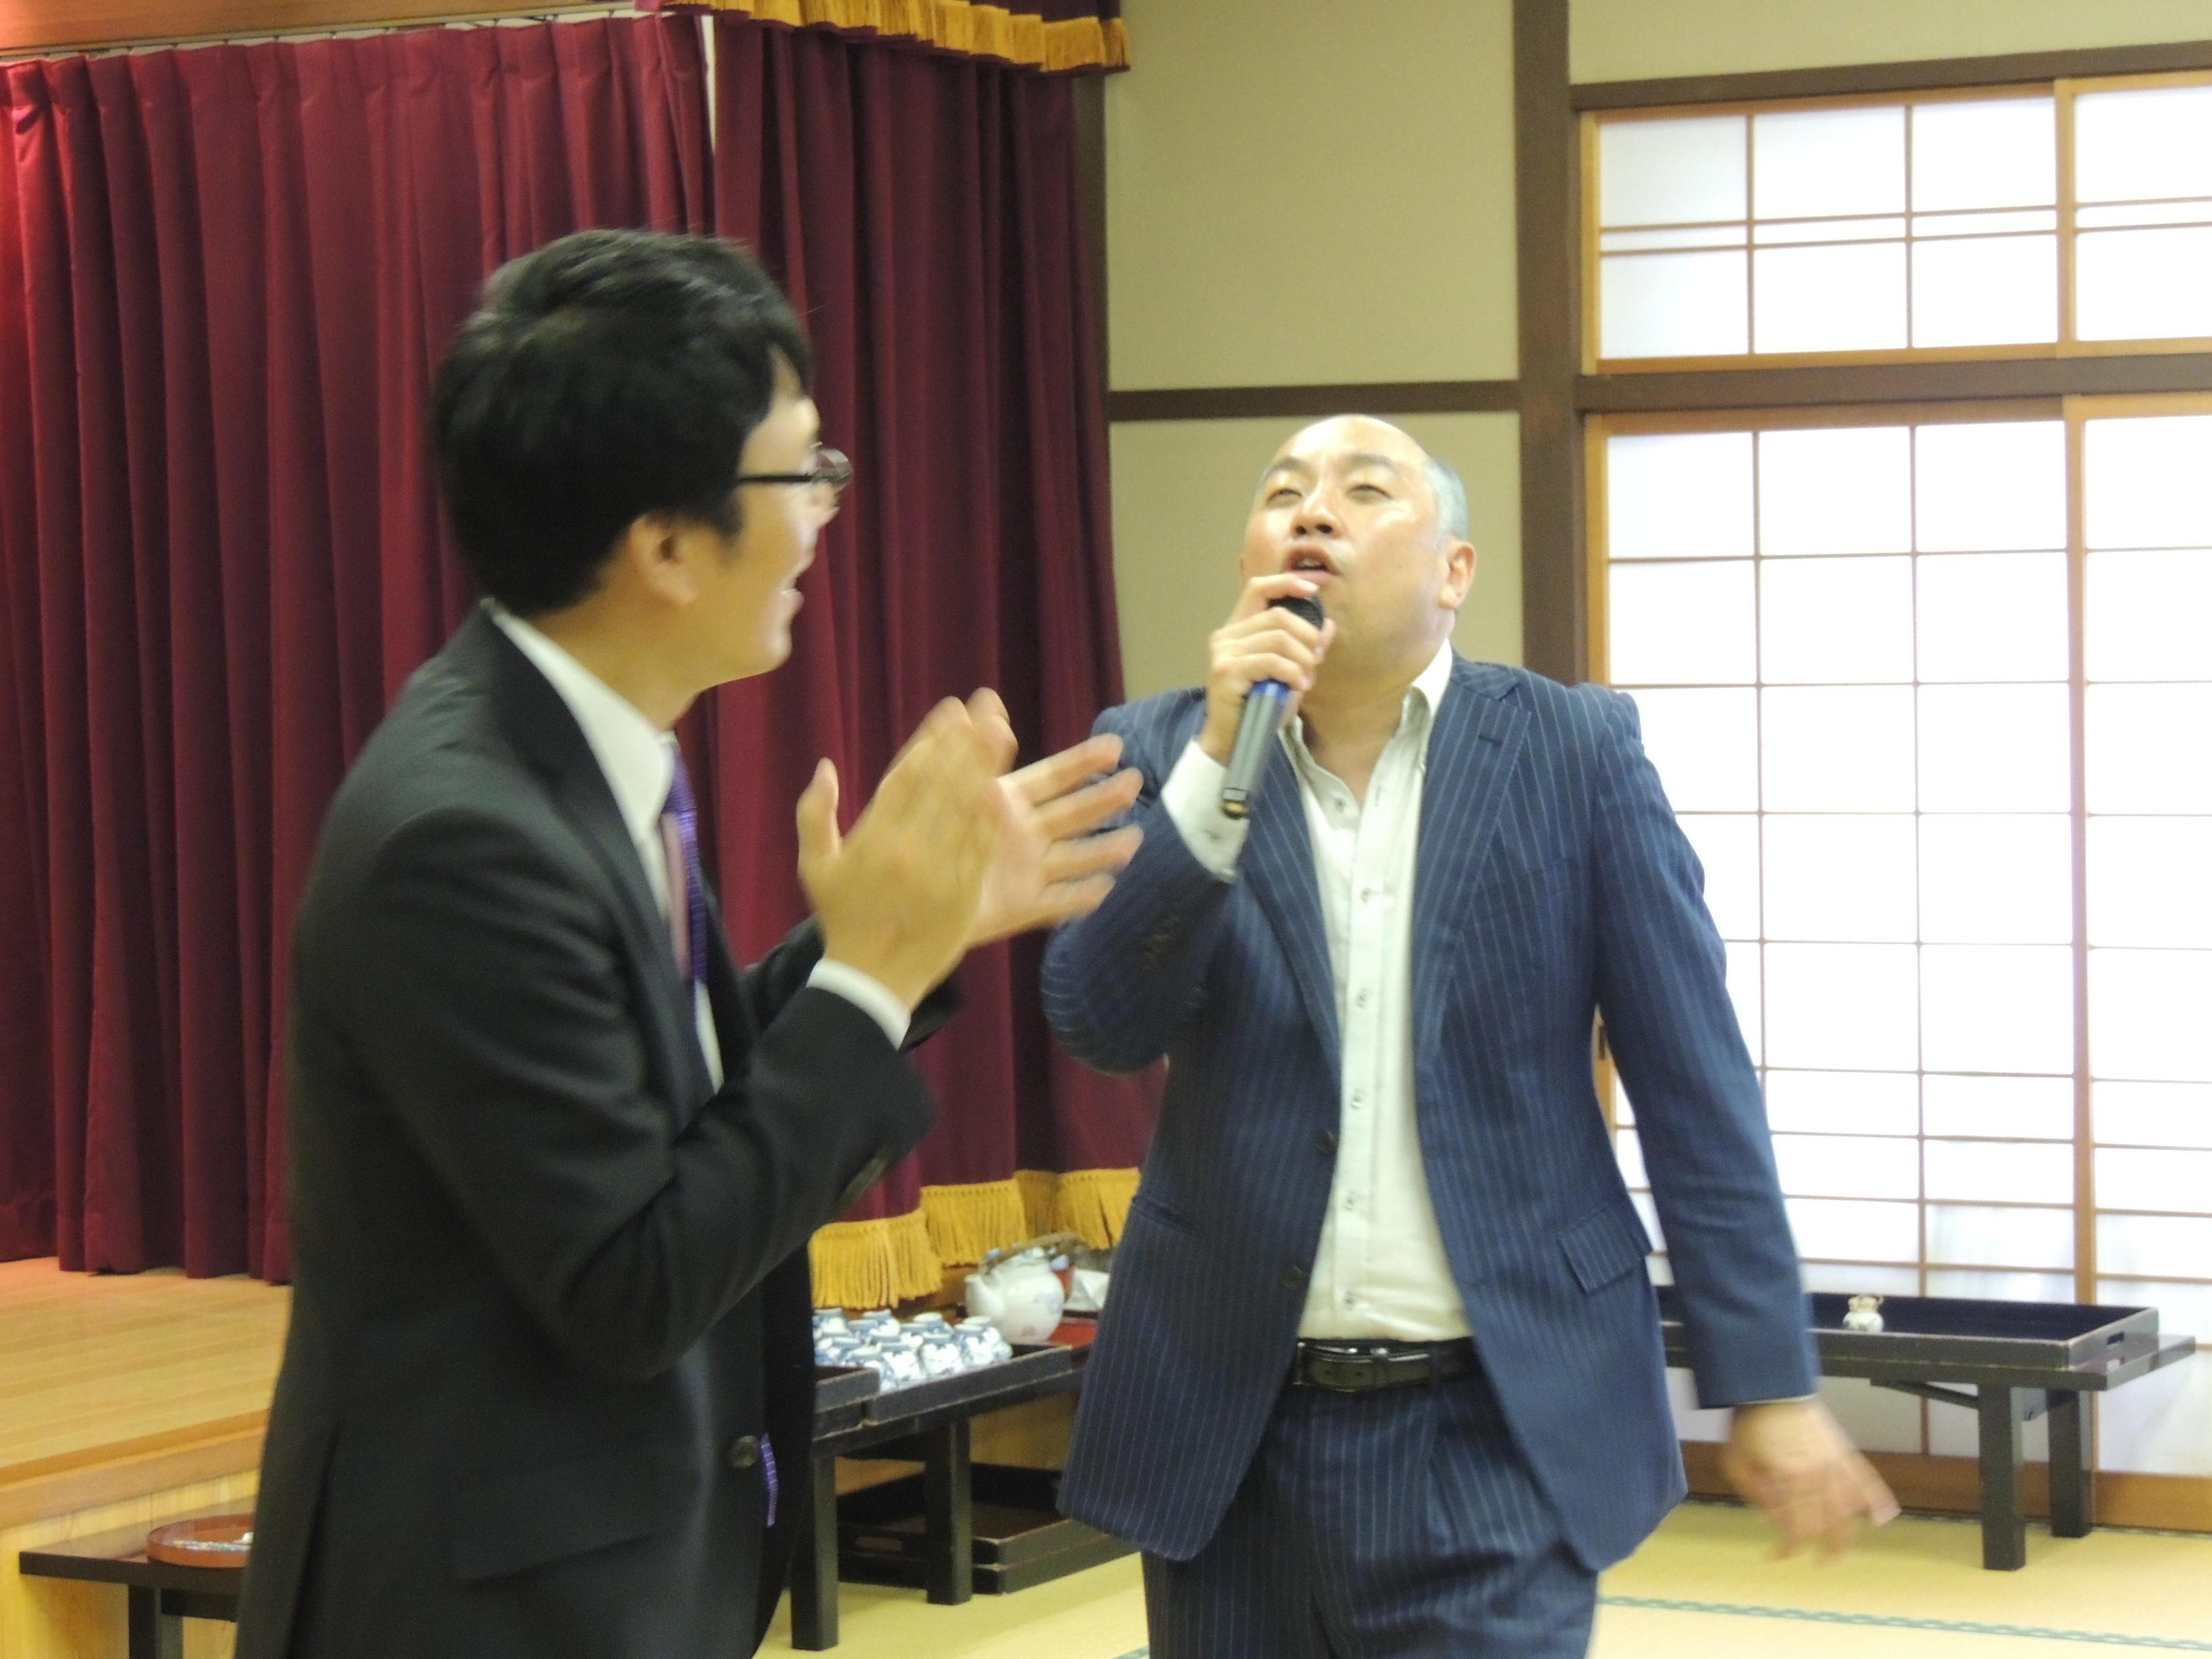 http://news.yoshimoto.co.jp/20160903210413-d7d7e34dfcd0fb0b0bade085a9ba2bebd9a7ee48.jpg